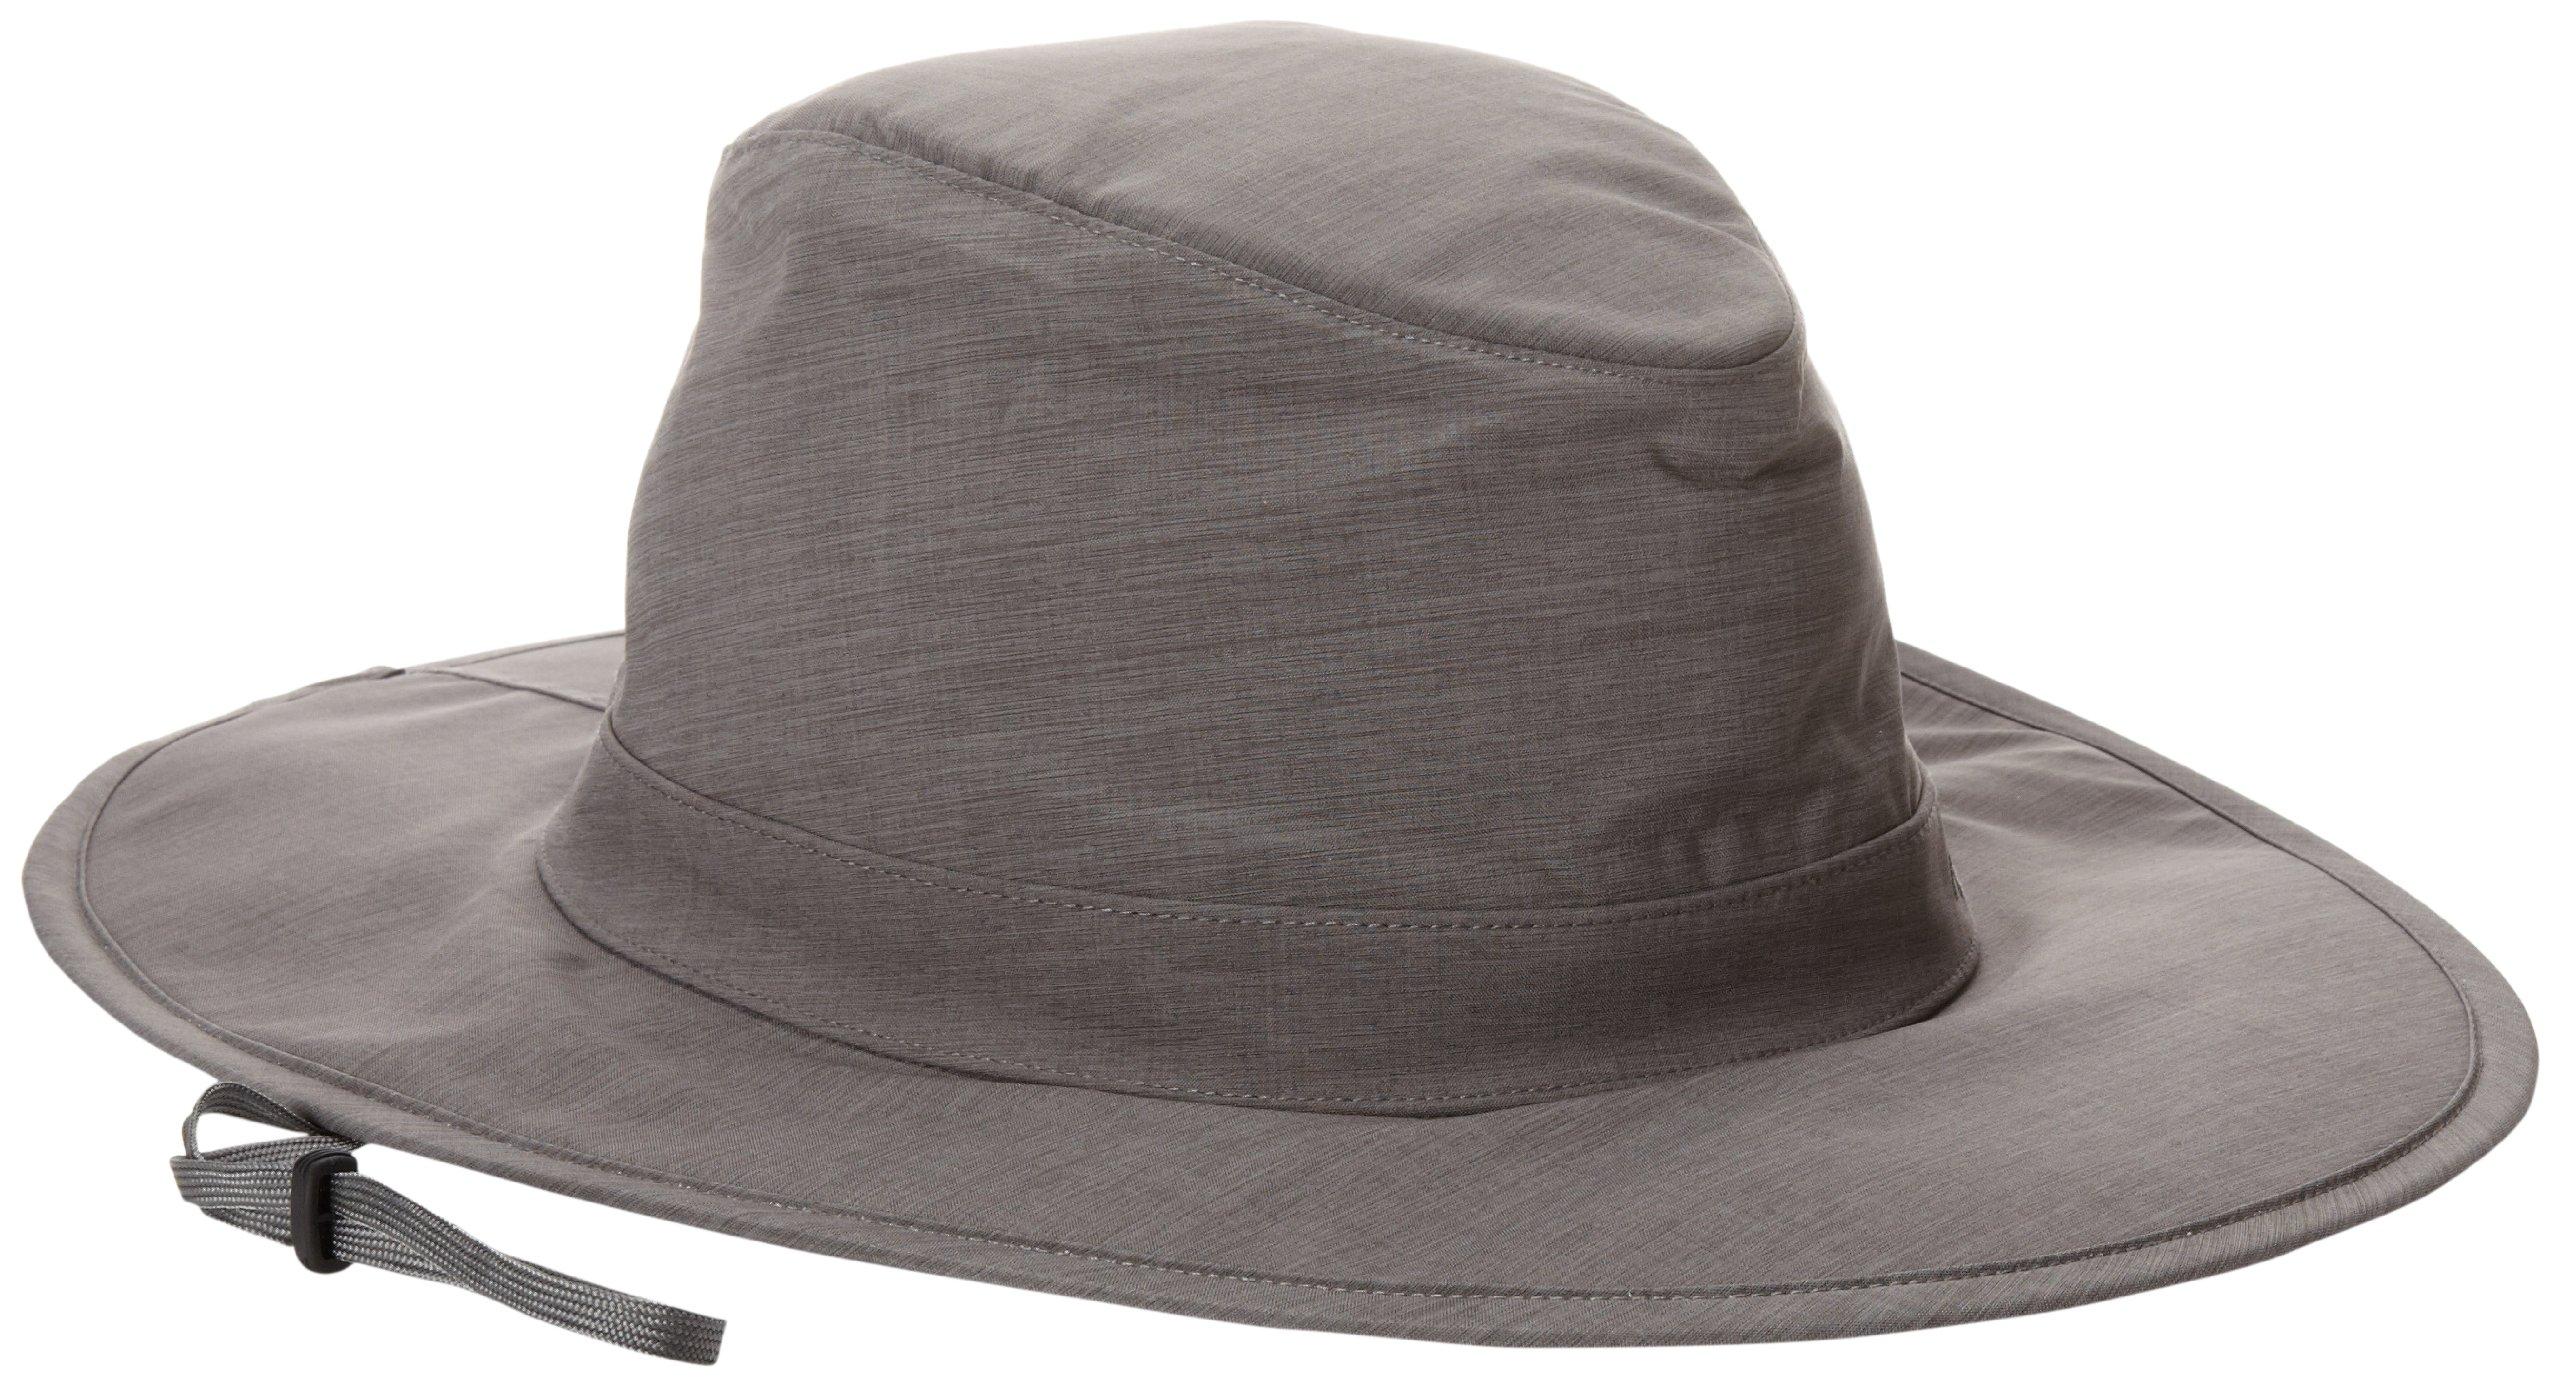 695ab351f7c Best Rated in Women s Rain Hats   Helpful Customer Reviews - Amazon.com